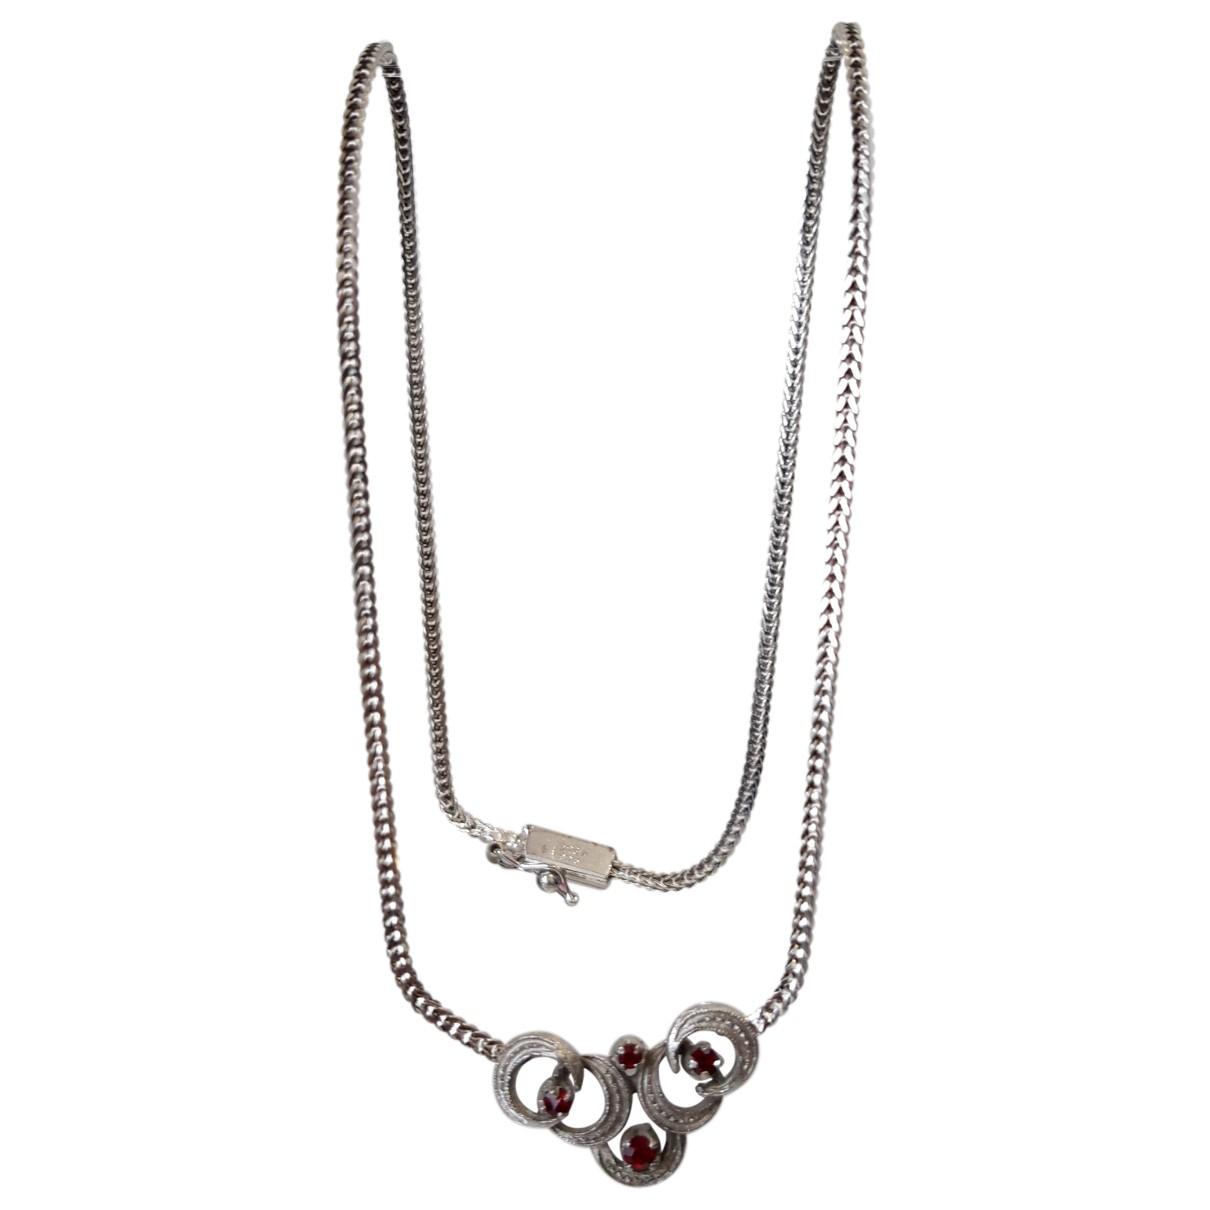 Non Signe / Unsigned Rubis Kette in  Silber Silber